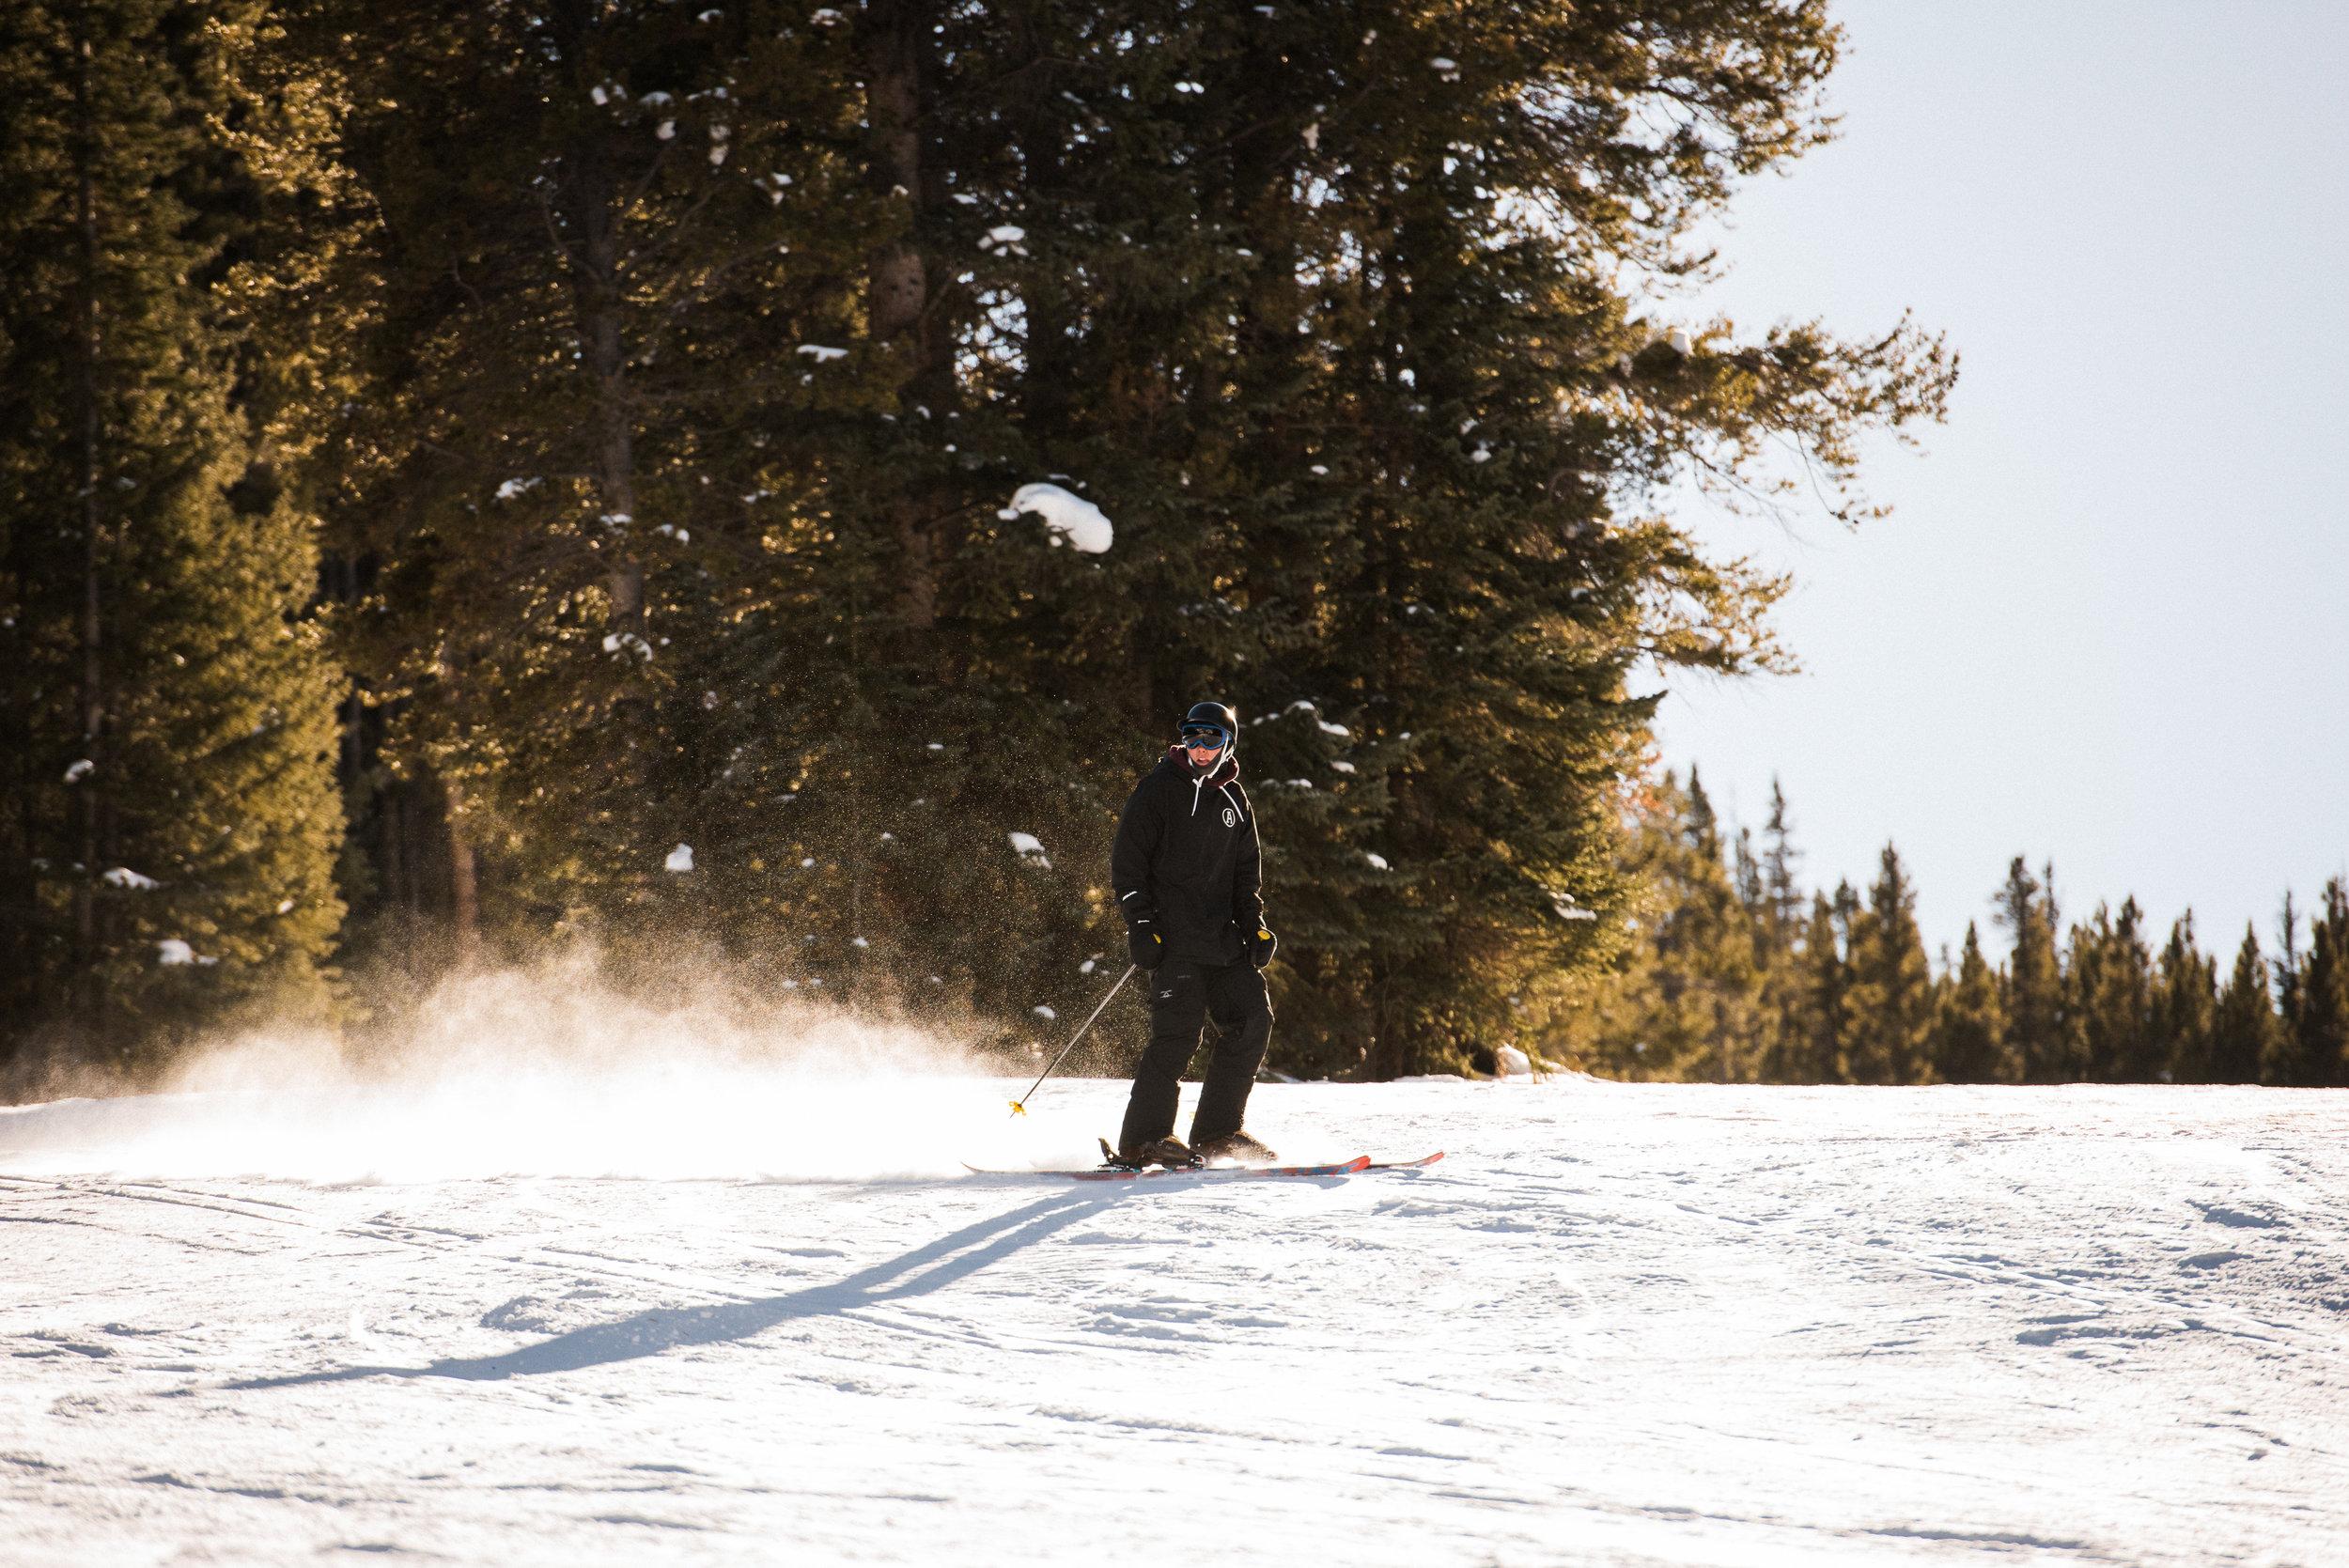 TaraShupe_Outdoor_Photographer_Loweprobags_Colorado_Copper_Mountains_Ski_46.jpg